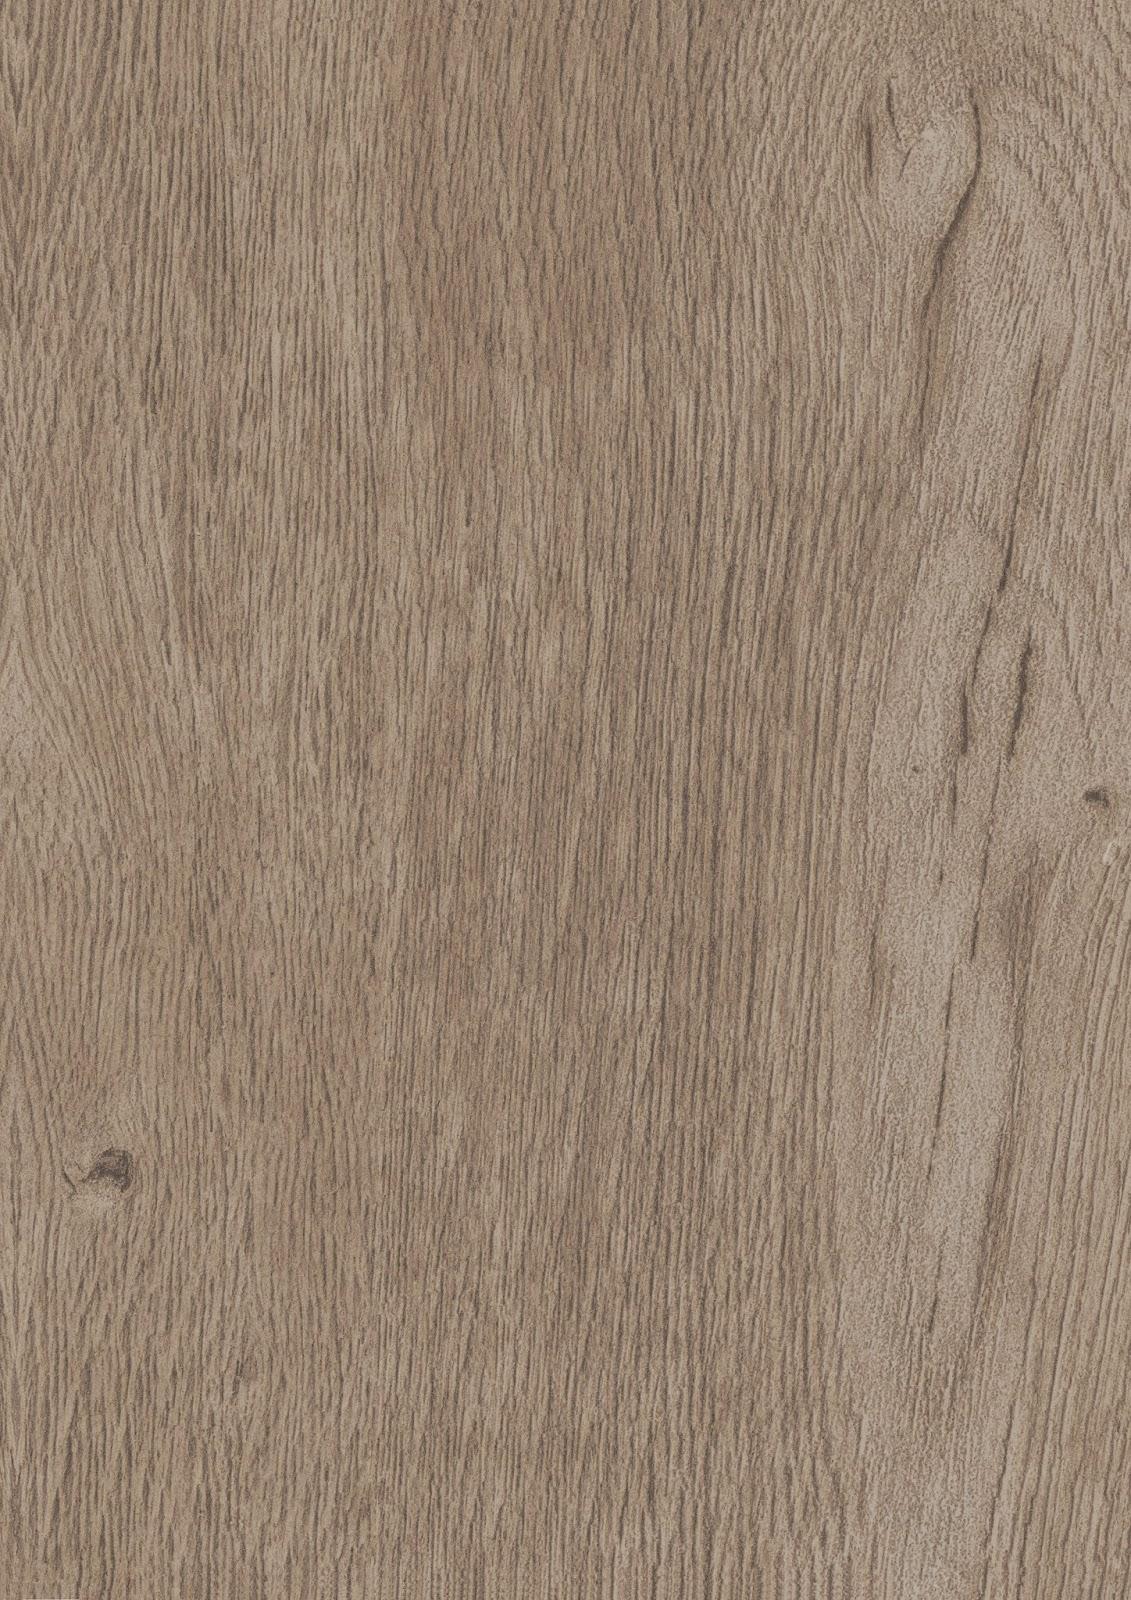 Текстура стена деревянная